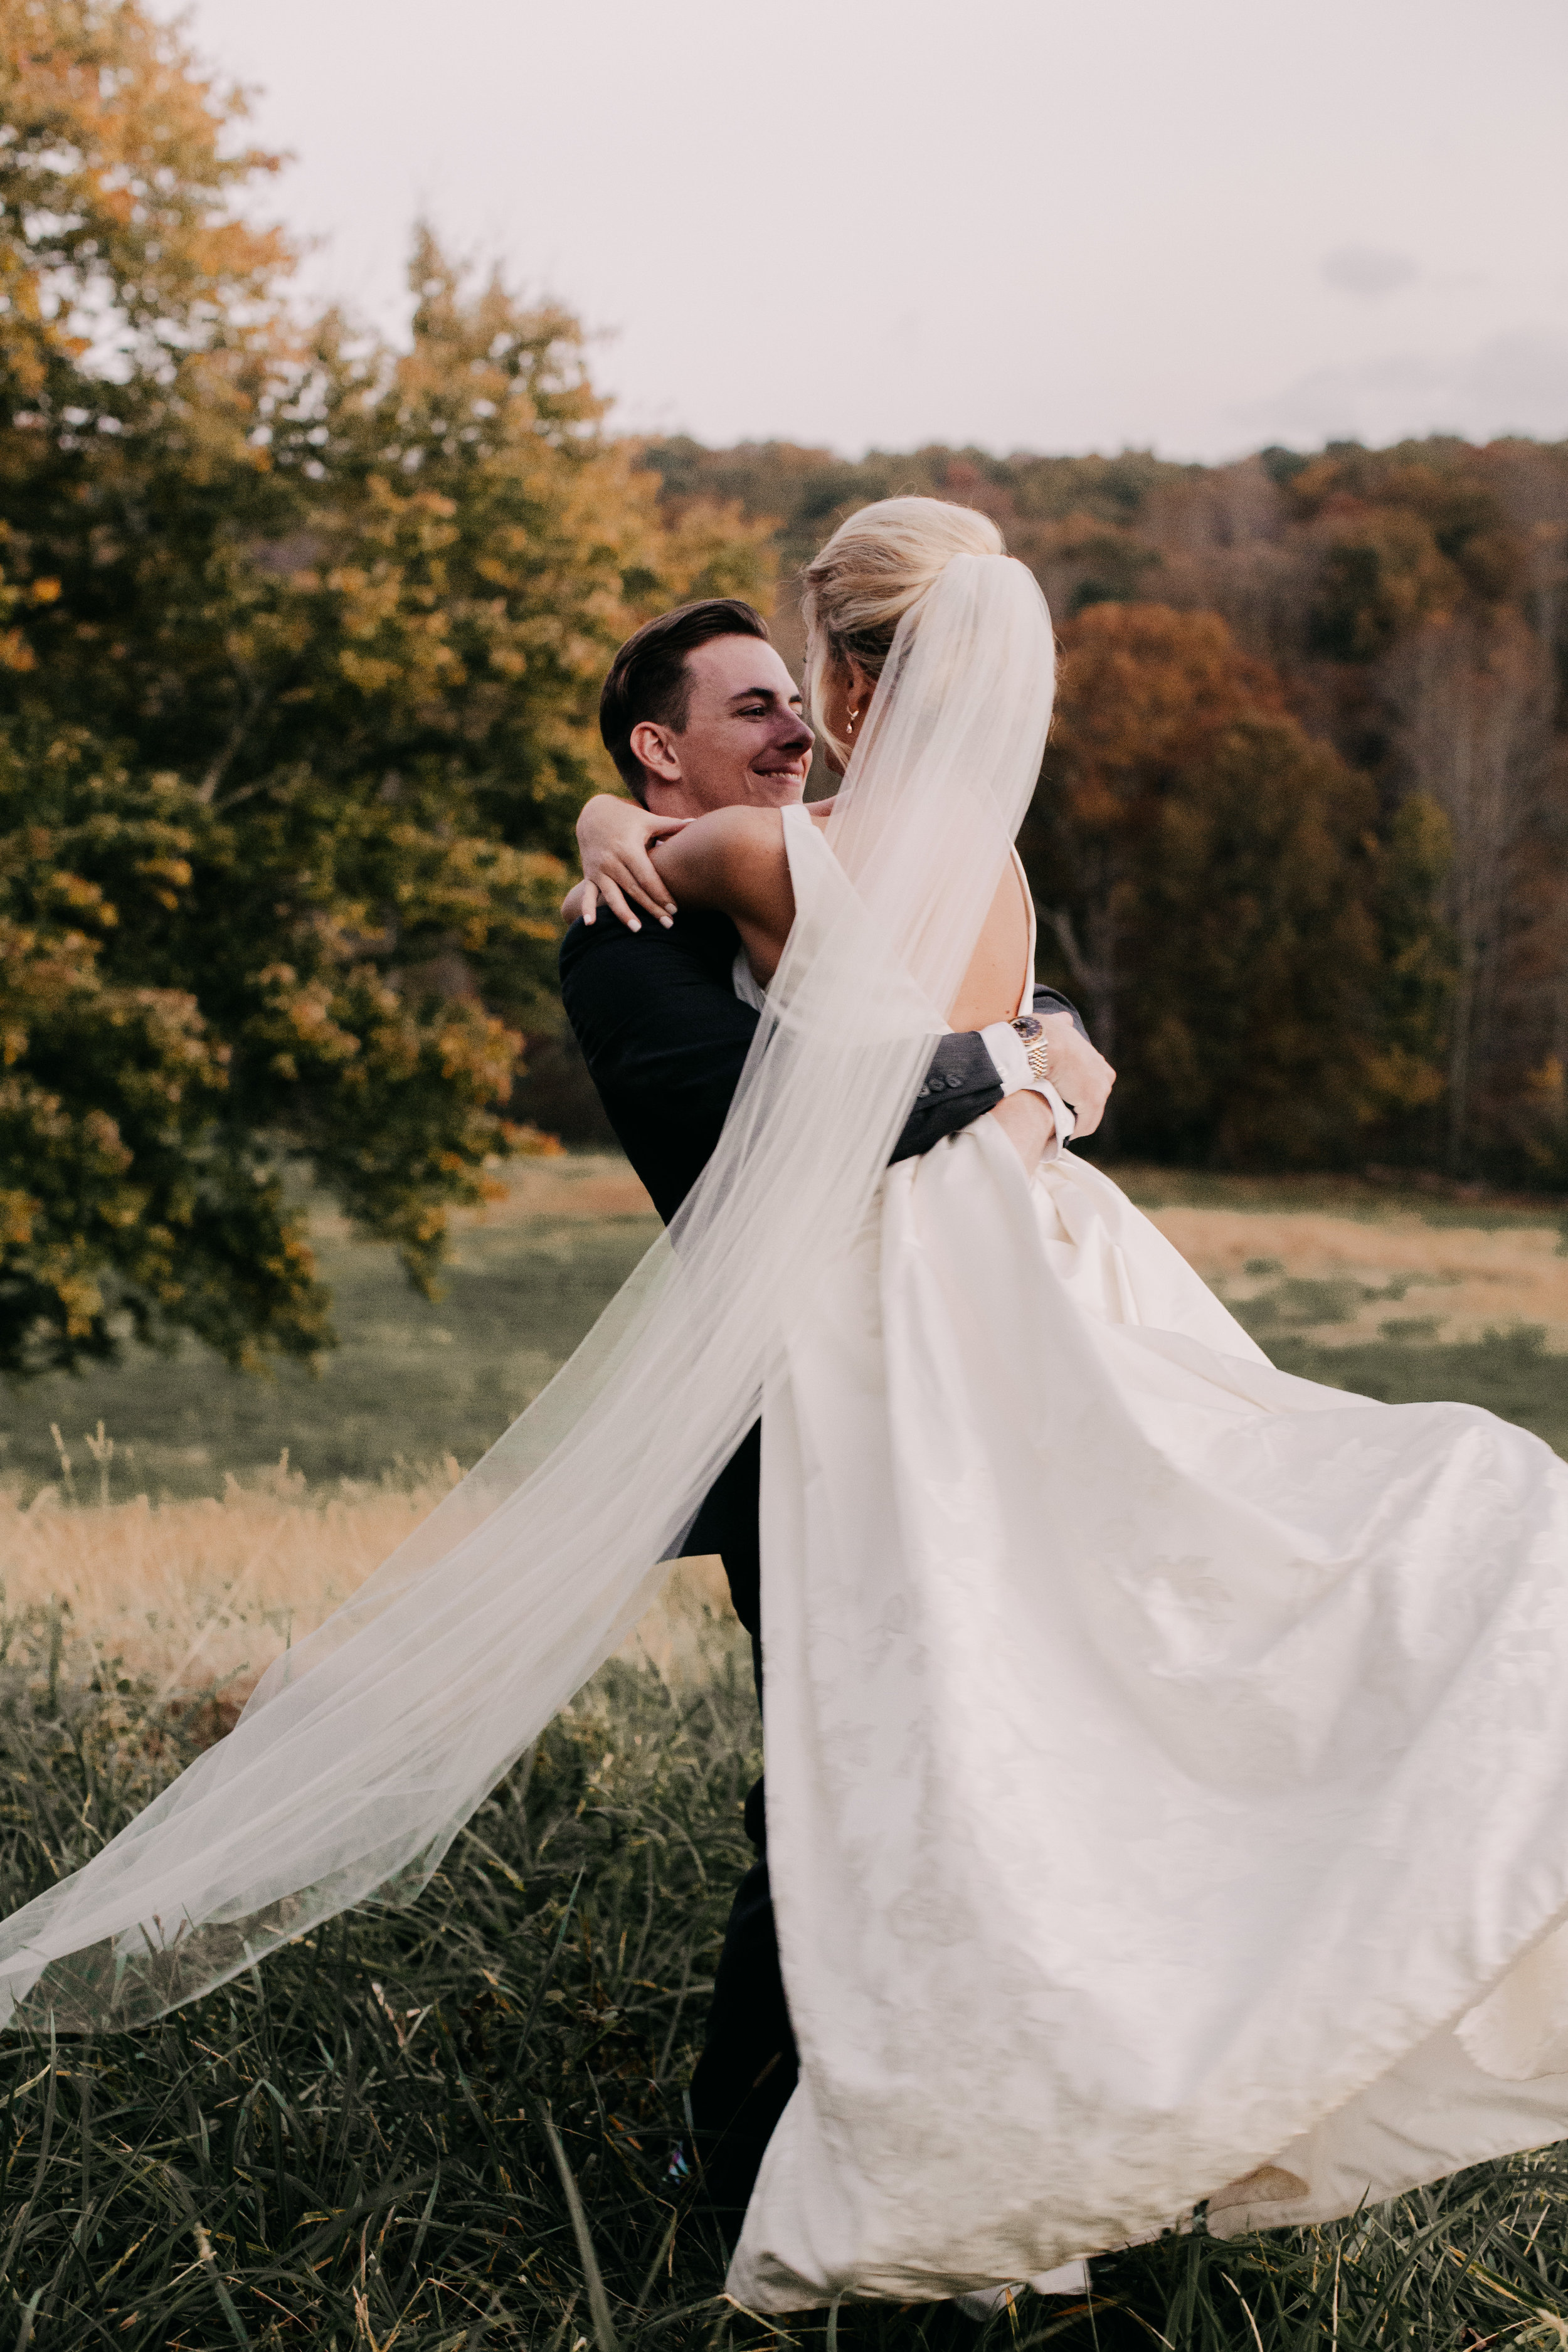 Kaylyn & Ryan Final Wedding Photos447.jpg